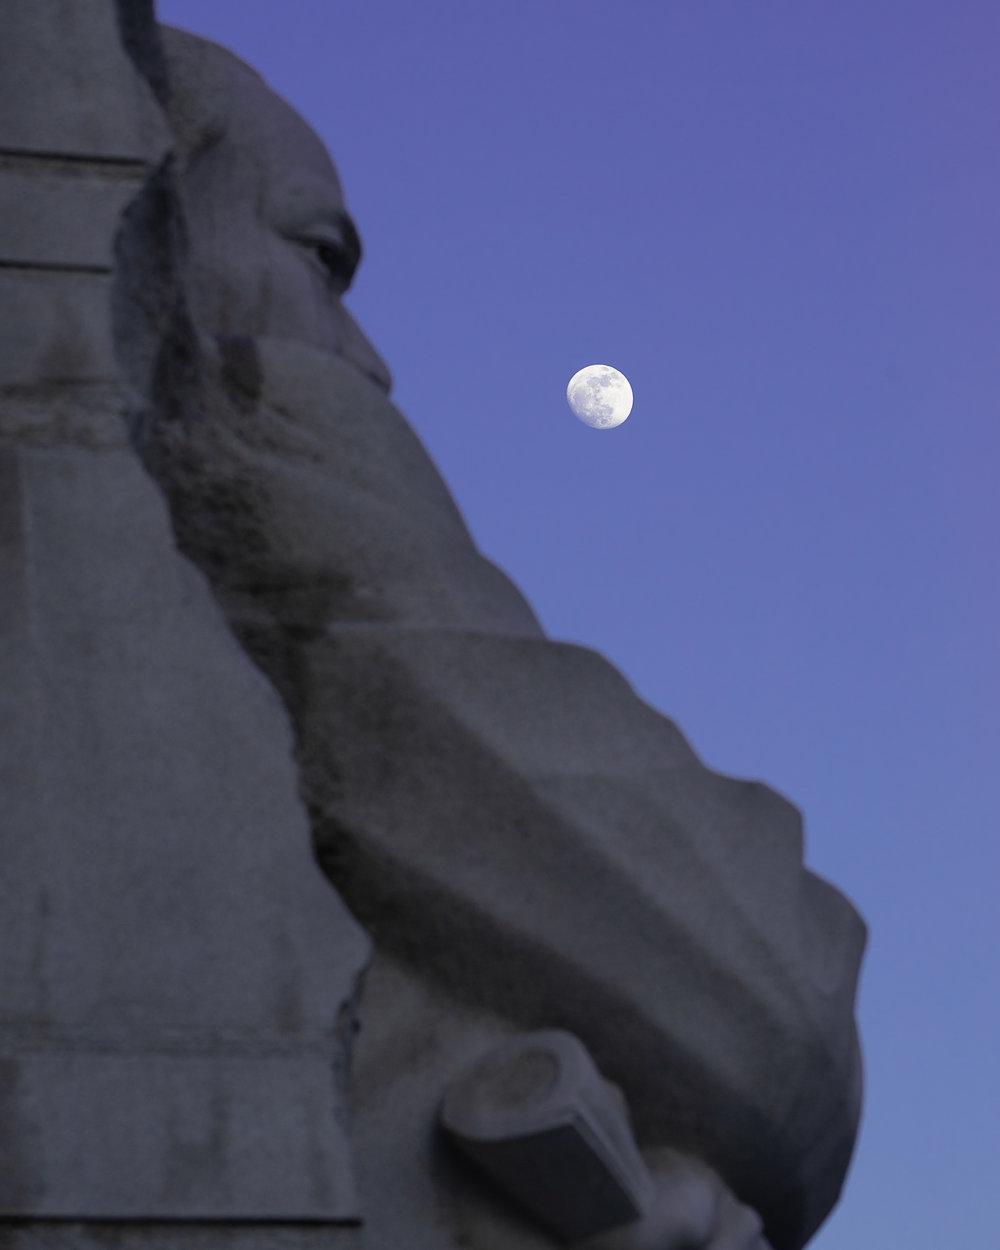 MLK Moon